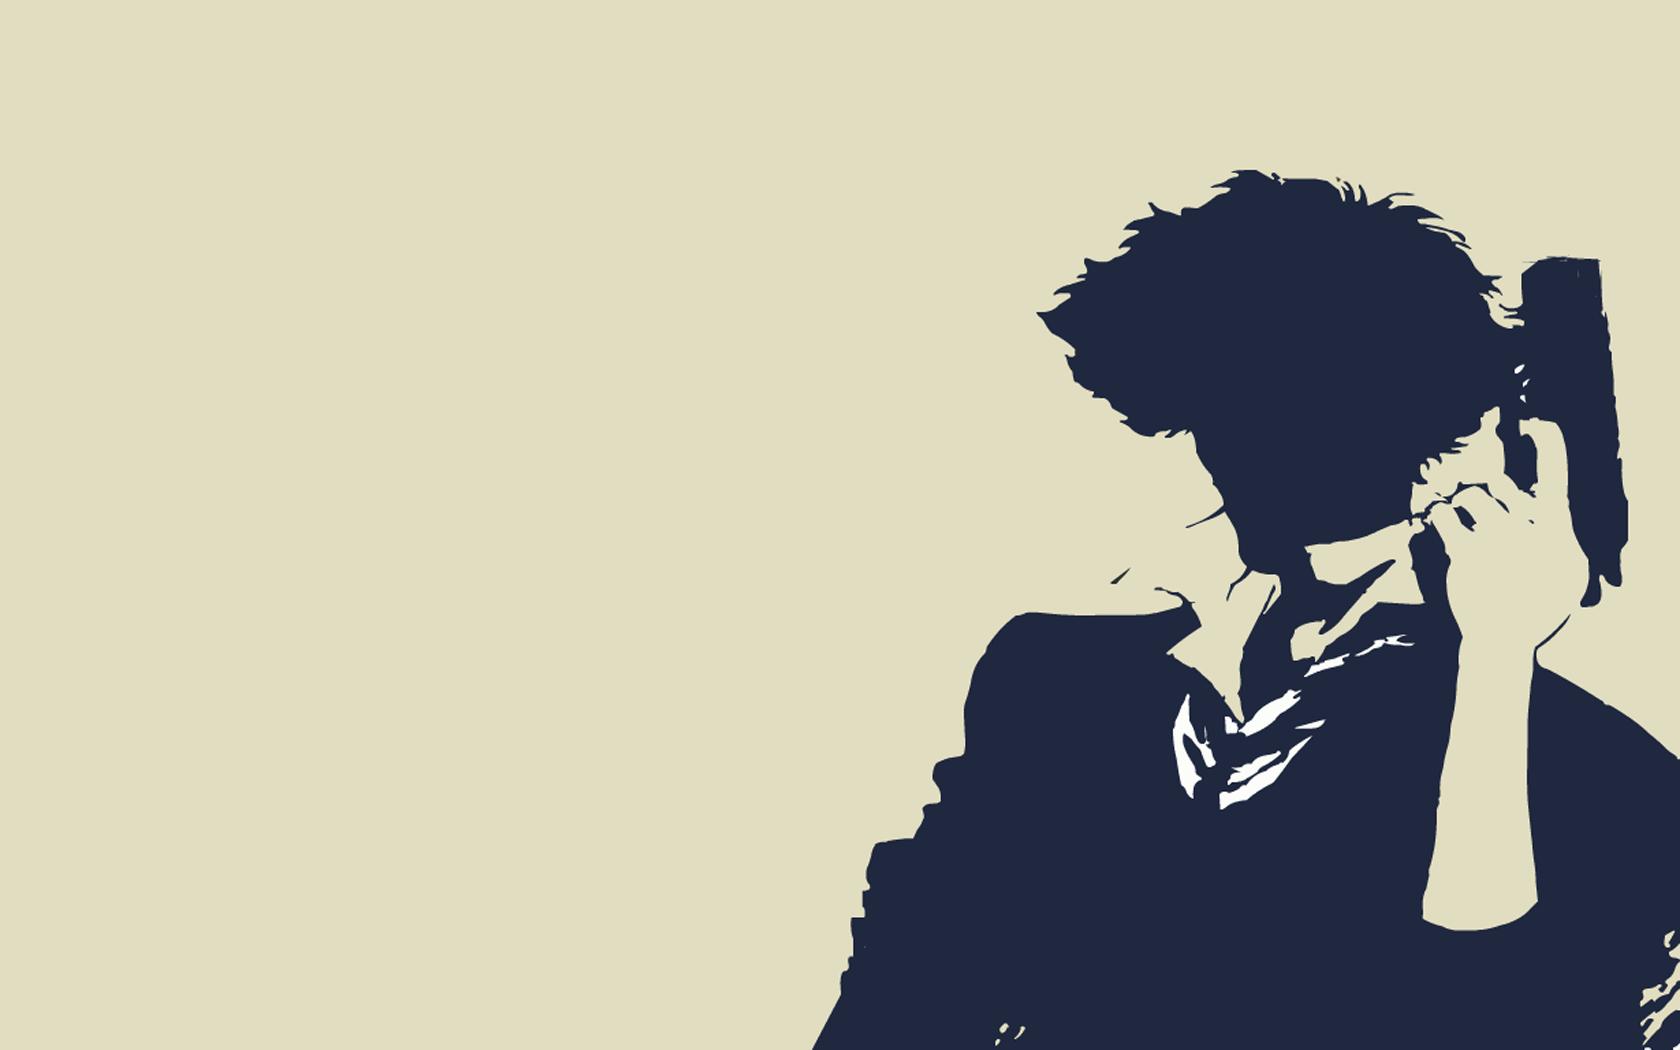 cowboy bebop spike spiegel simple background HD Wallpaper of Anime 1680x1050